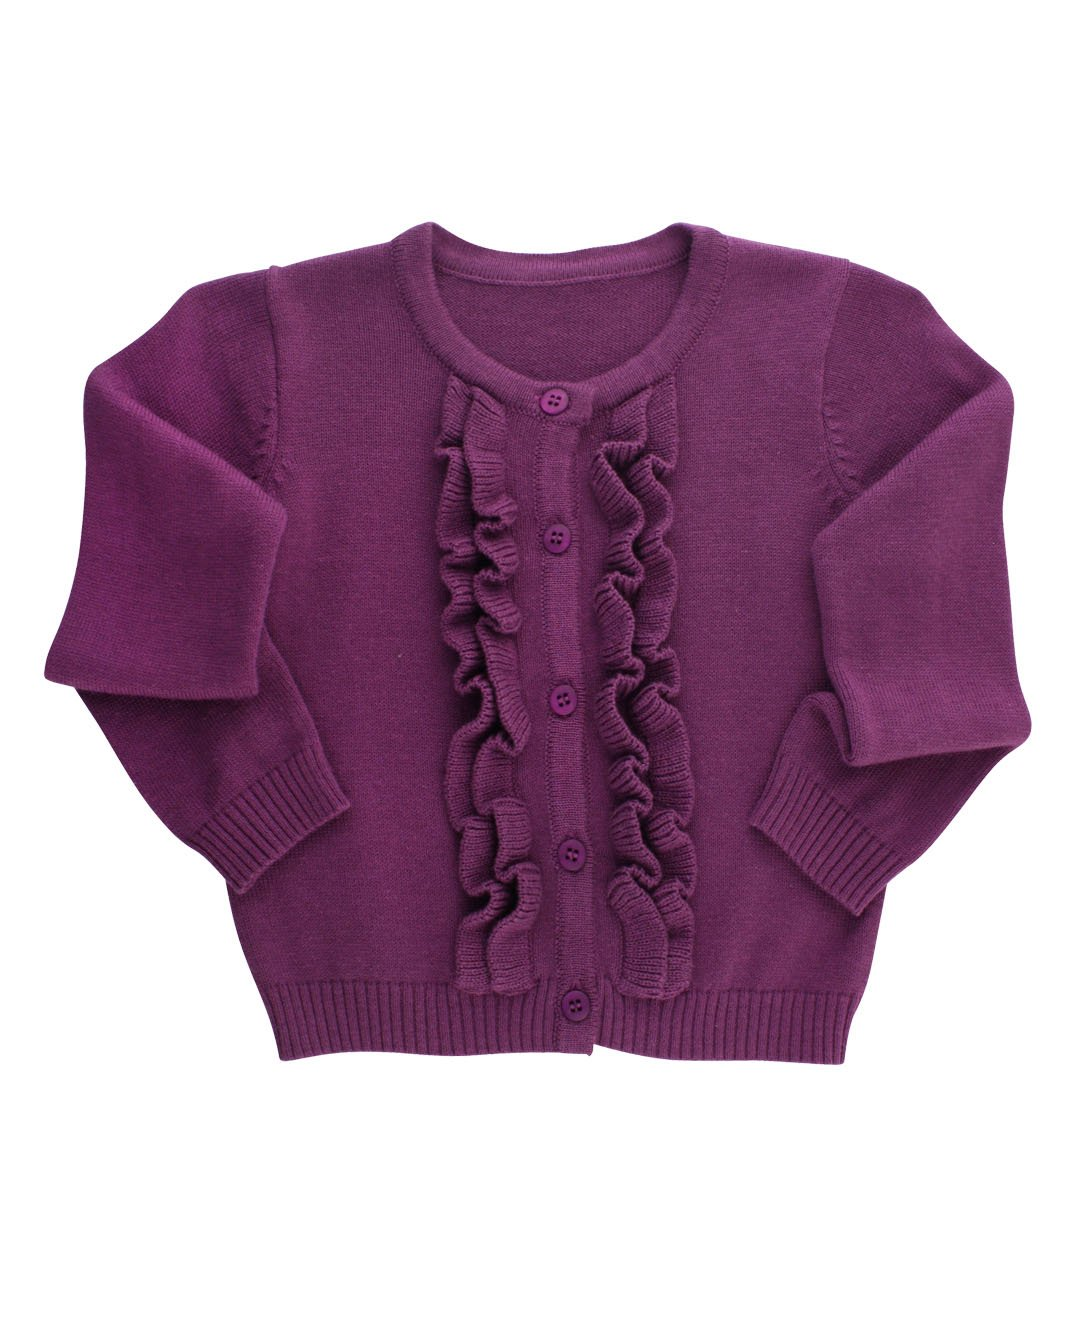 RuffleButts Infant/Toddler Girls Ruffled Long Sleeve Cardigan - Purple - 3-6m